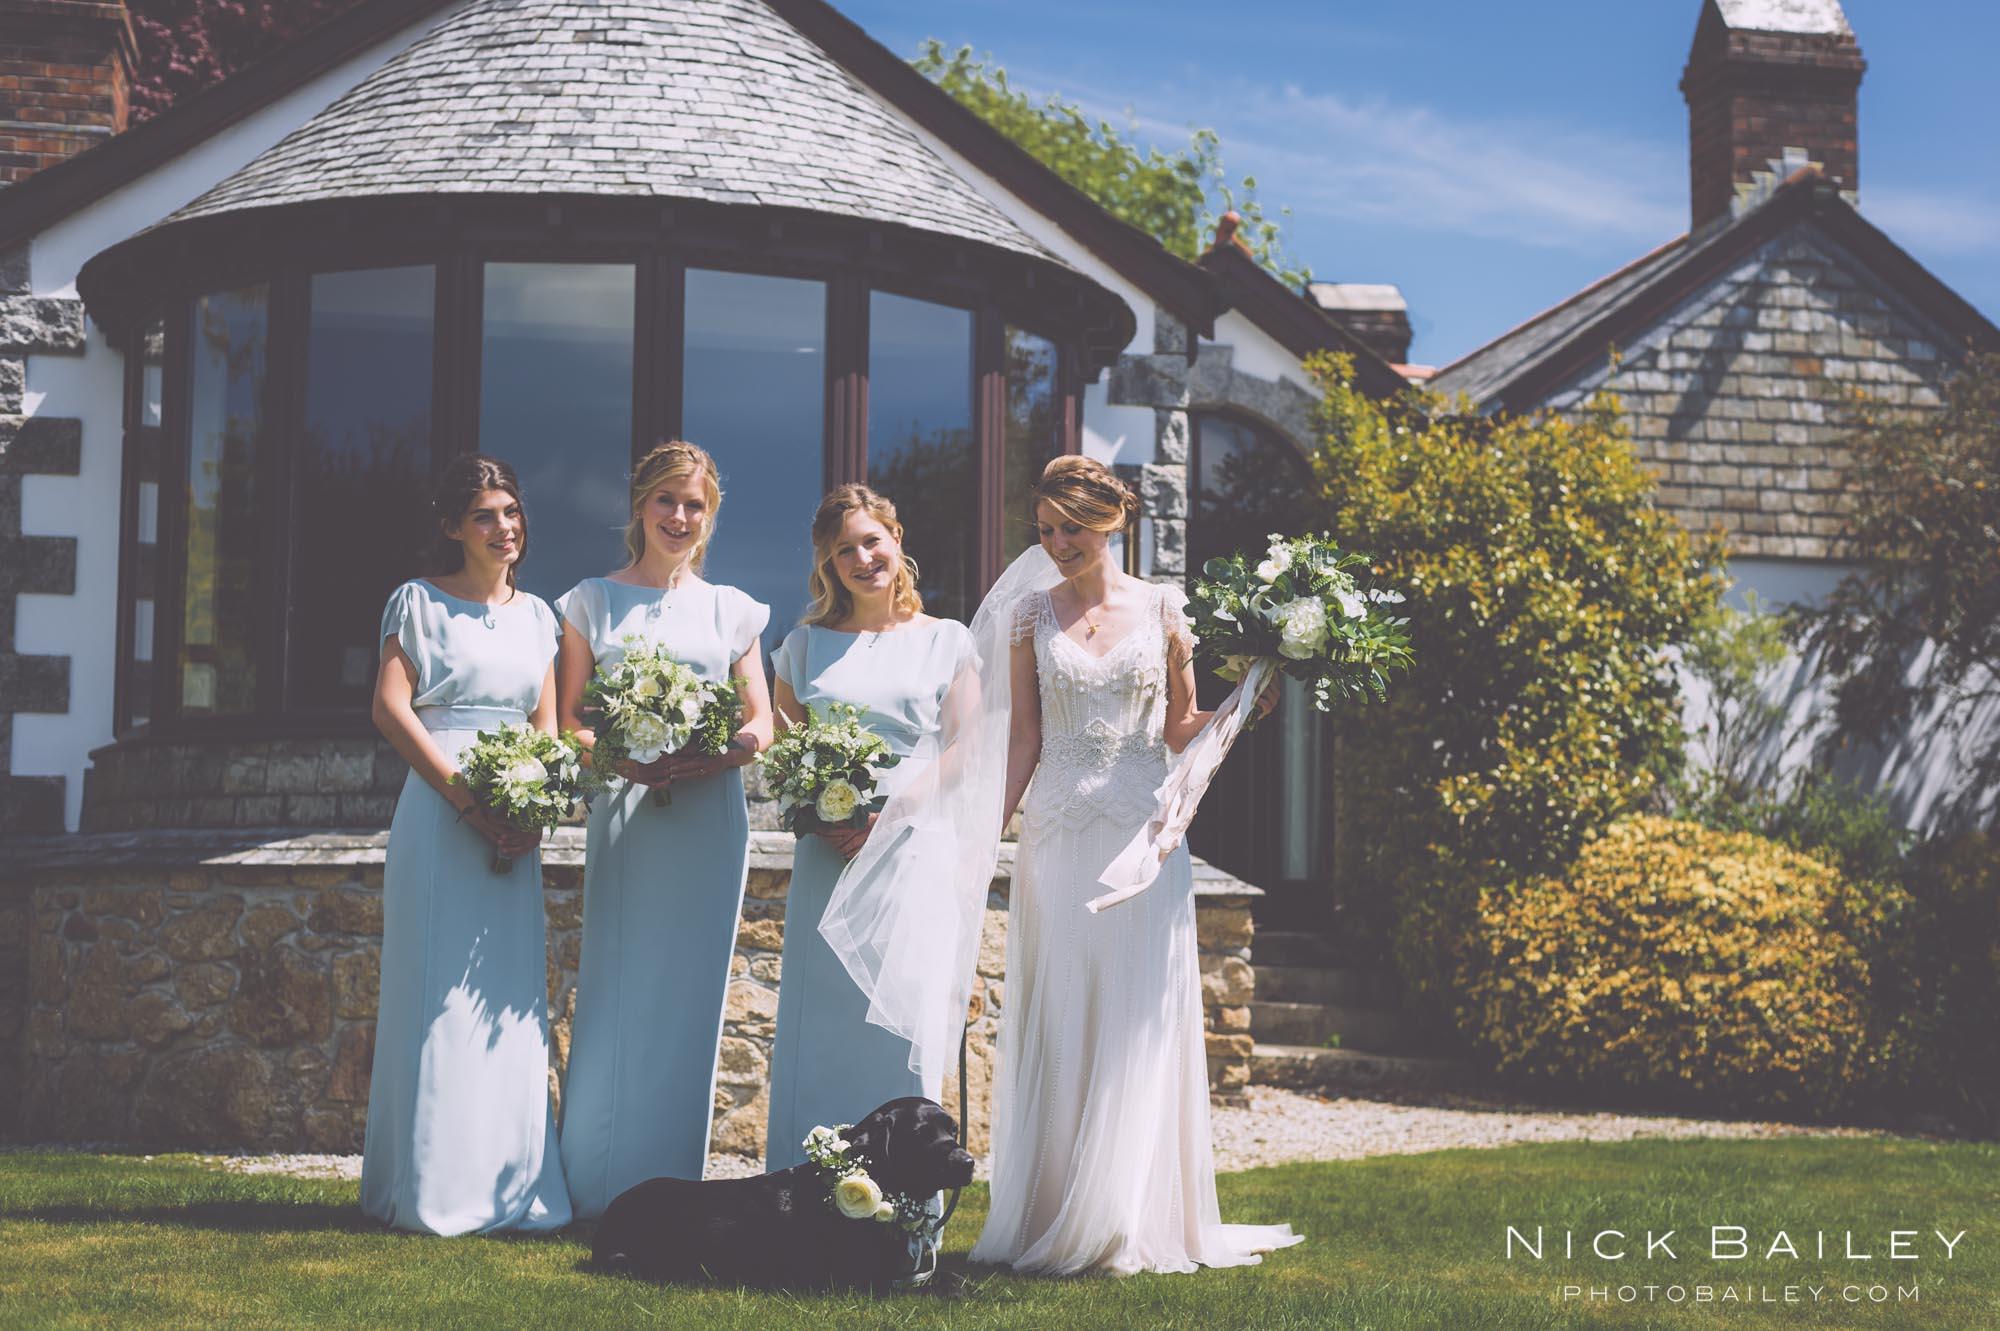 wedding-photographer-bodmin-29.jpg